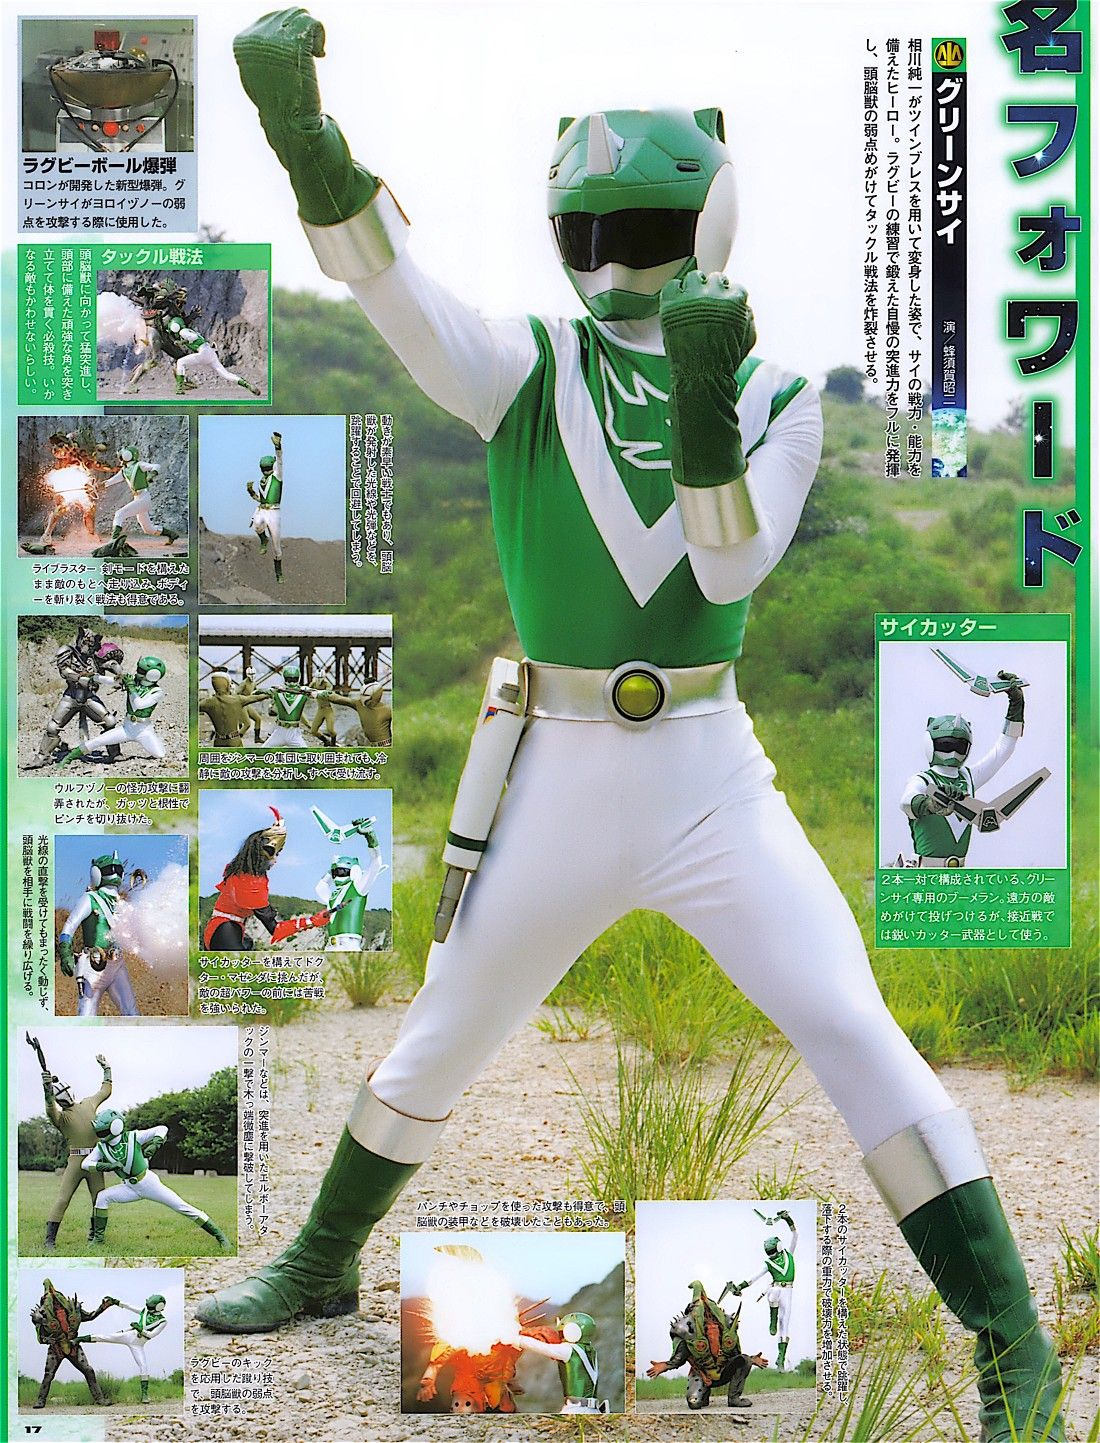 green sai パワーレンジャー ヒーロー 戦隊ヒーロー